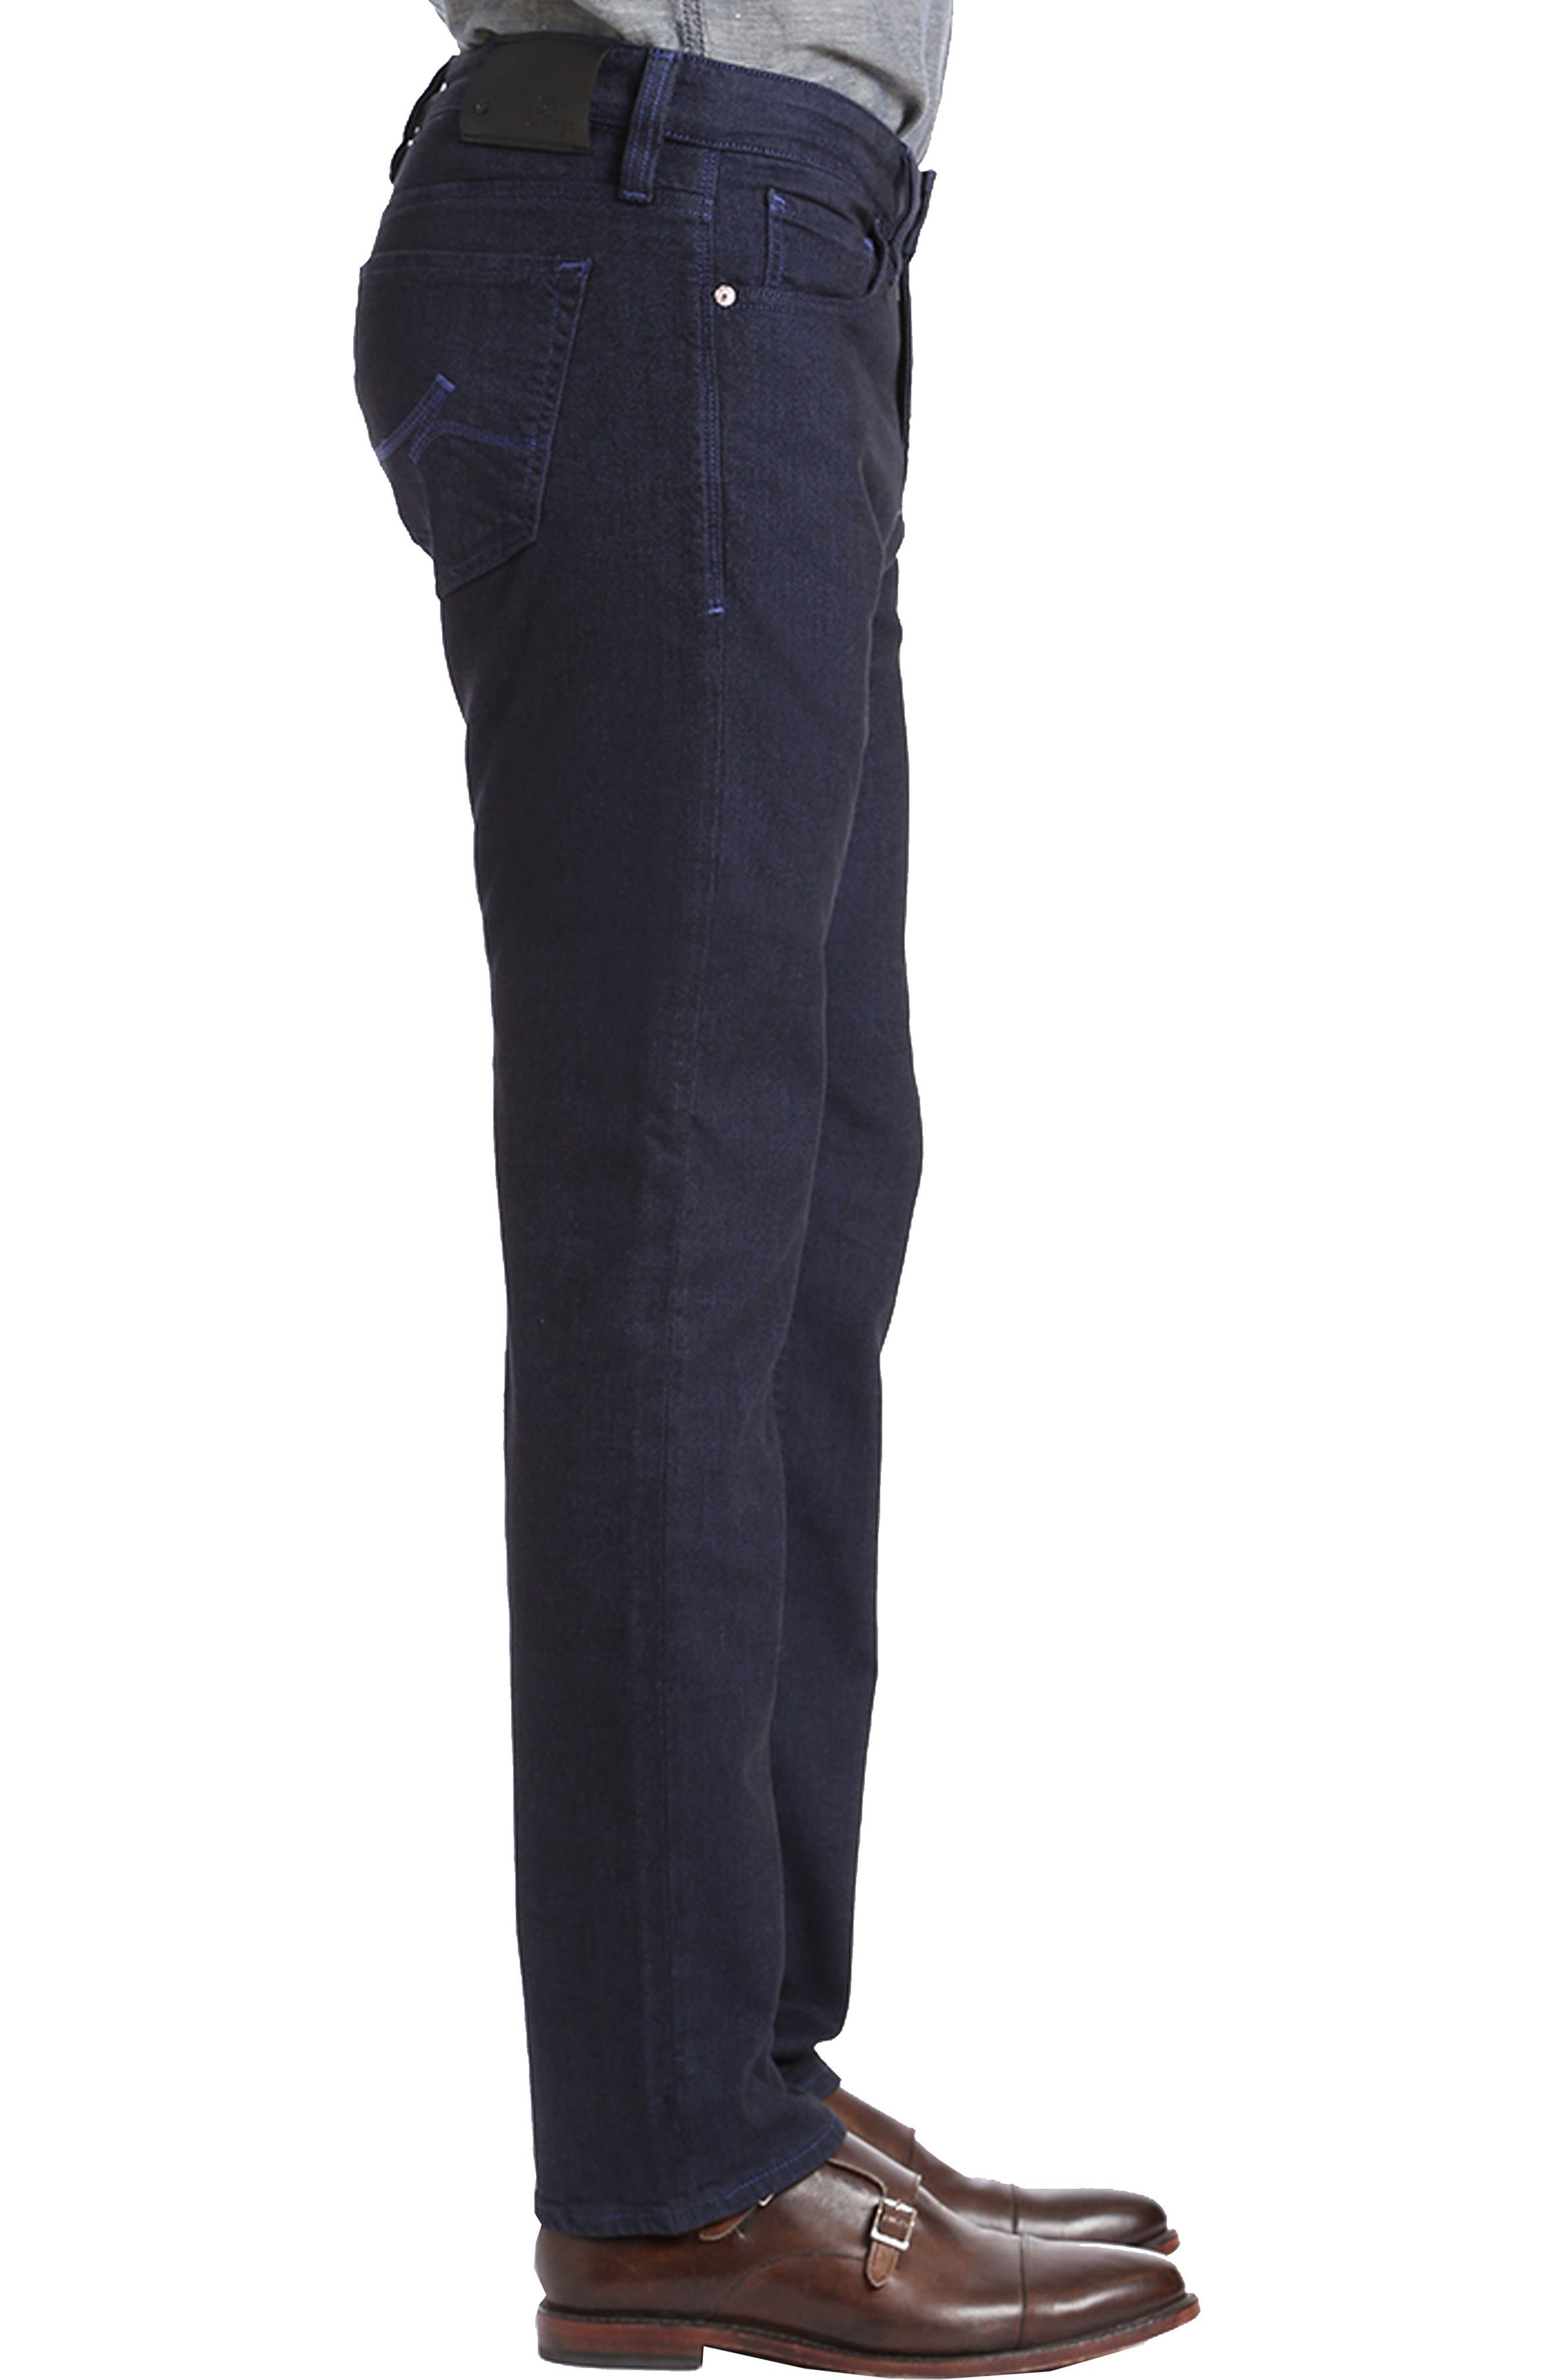 Courage Straight Leg Jeans,                             Alternate thumbnail 3, color,                             401